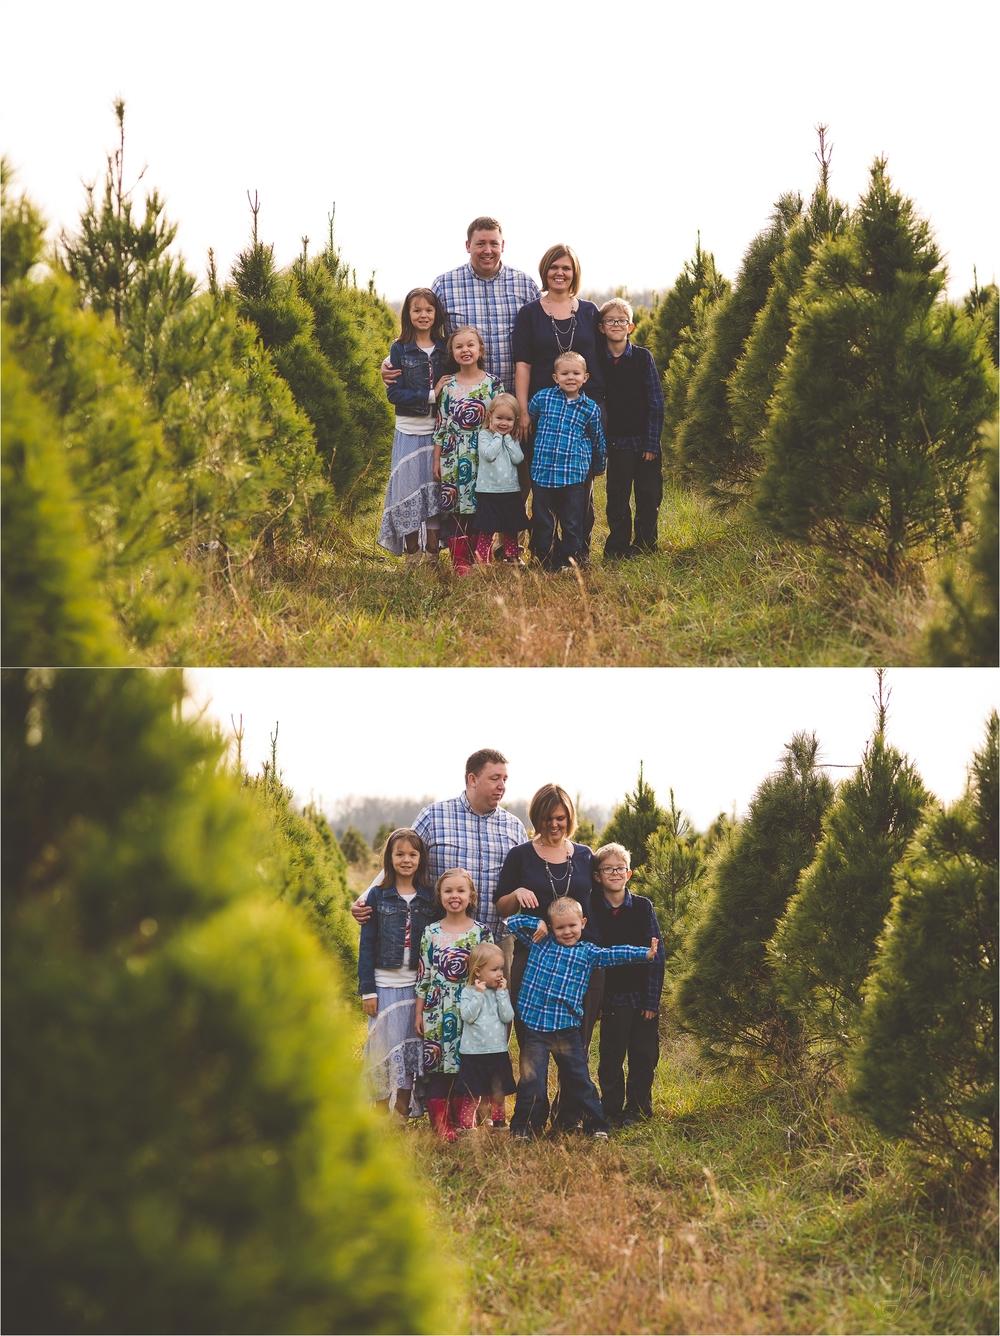 christmas-tree-farm-session-pnw-jannicka-mayte_0002.jpg